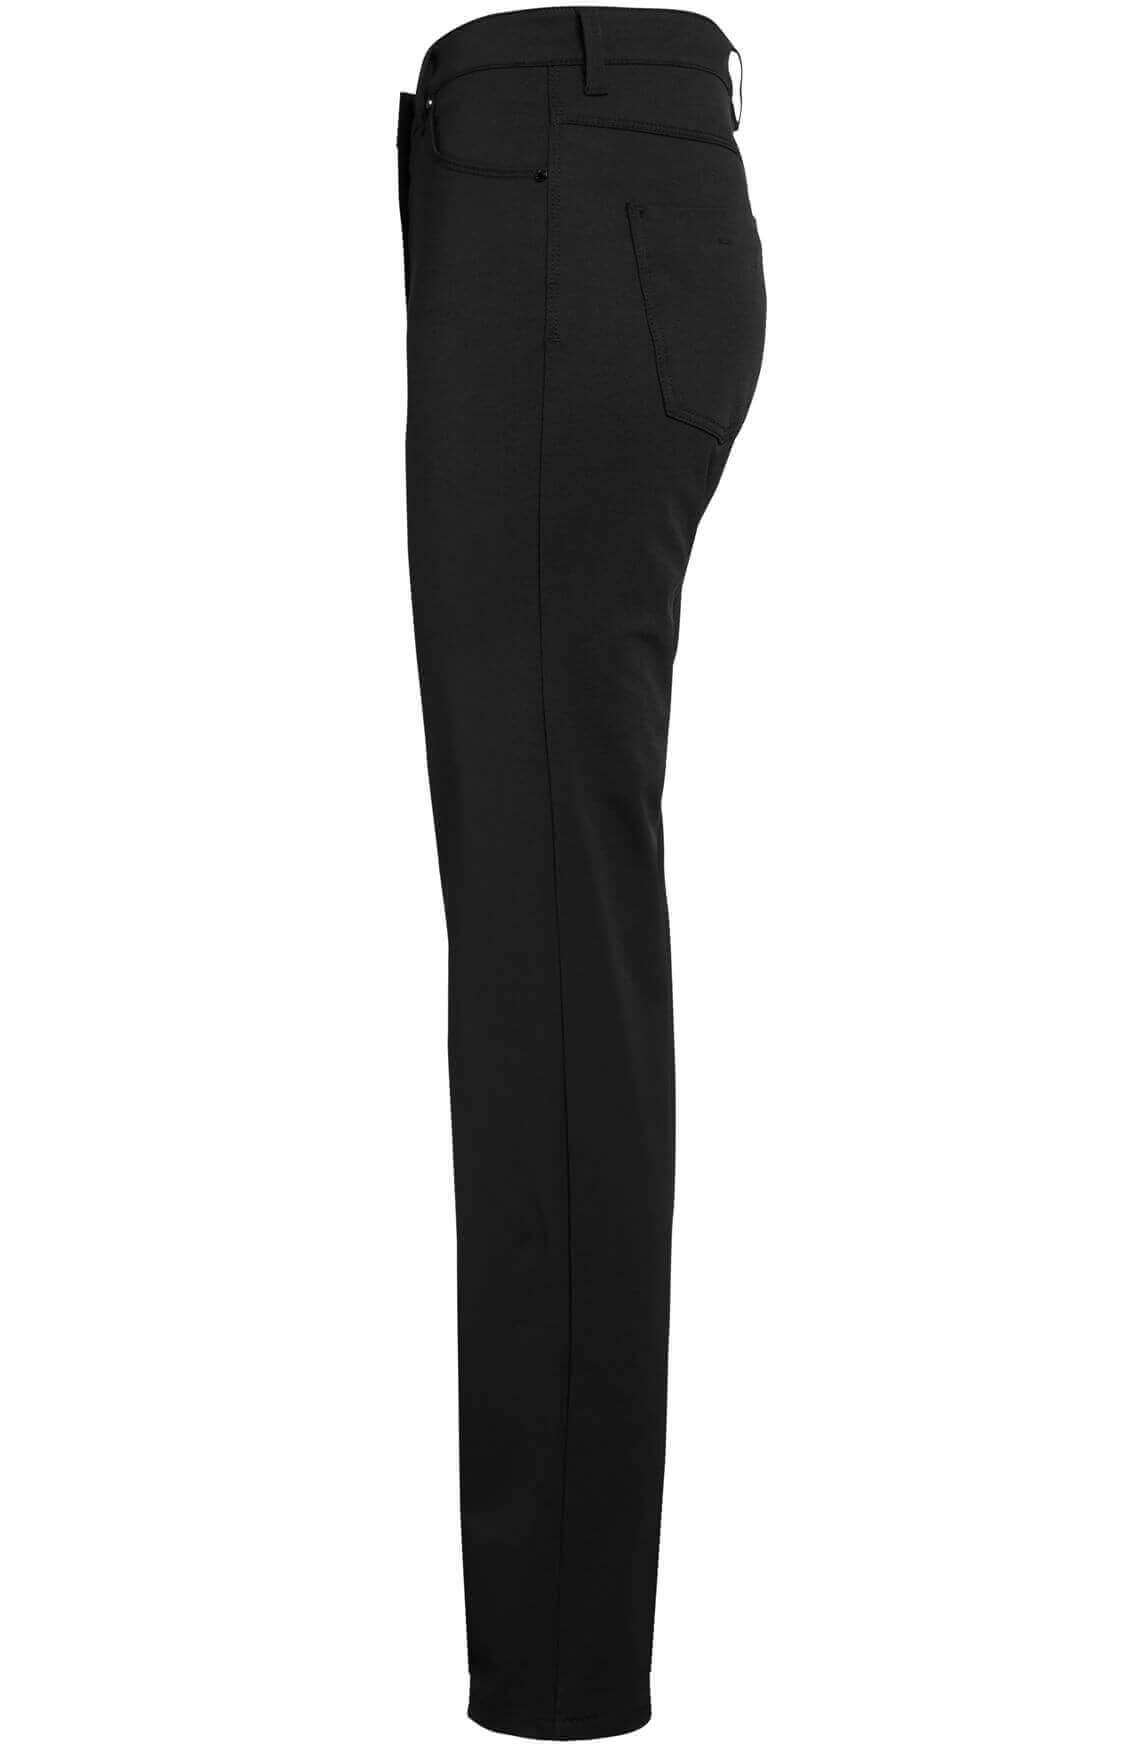 Rosner Dames L32 Audrey pantalon zwart